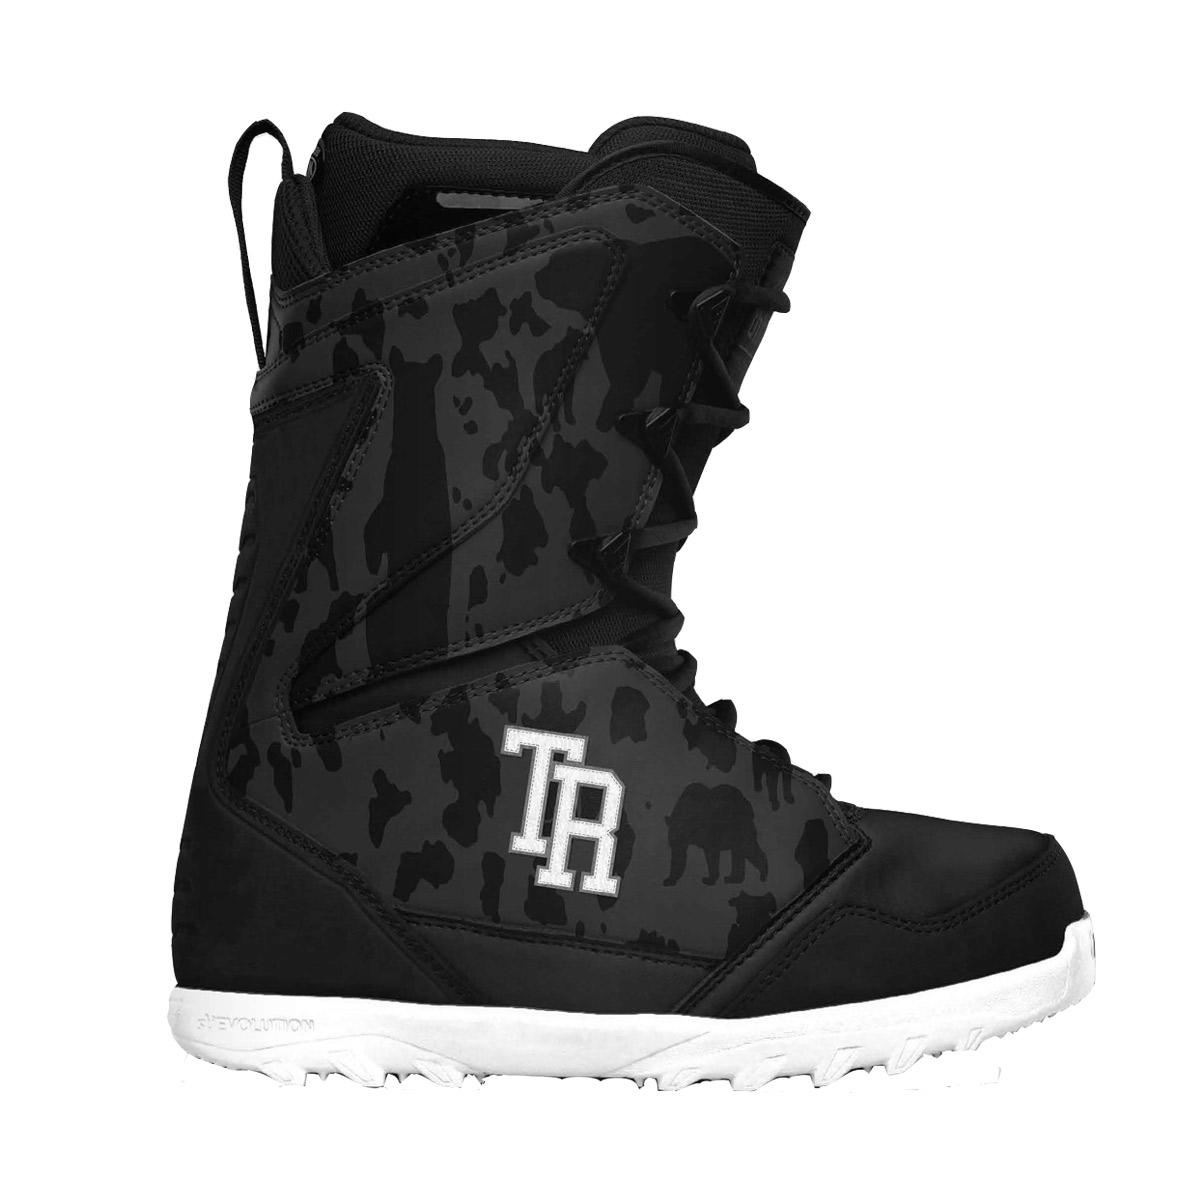 Ботинки для сноуборда TERROR Defender Black 2018